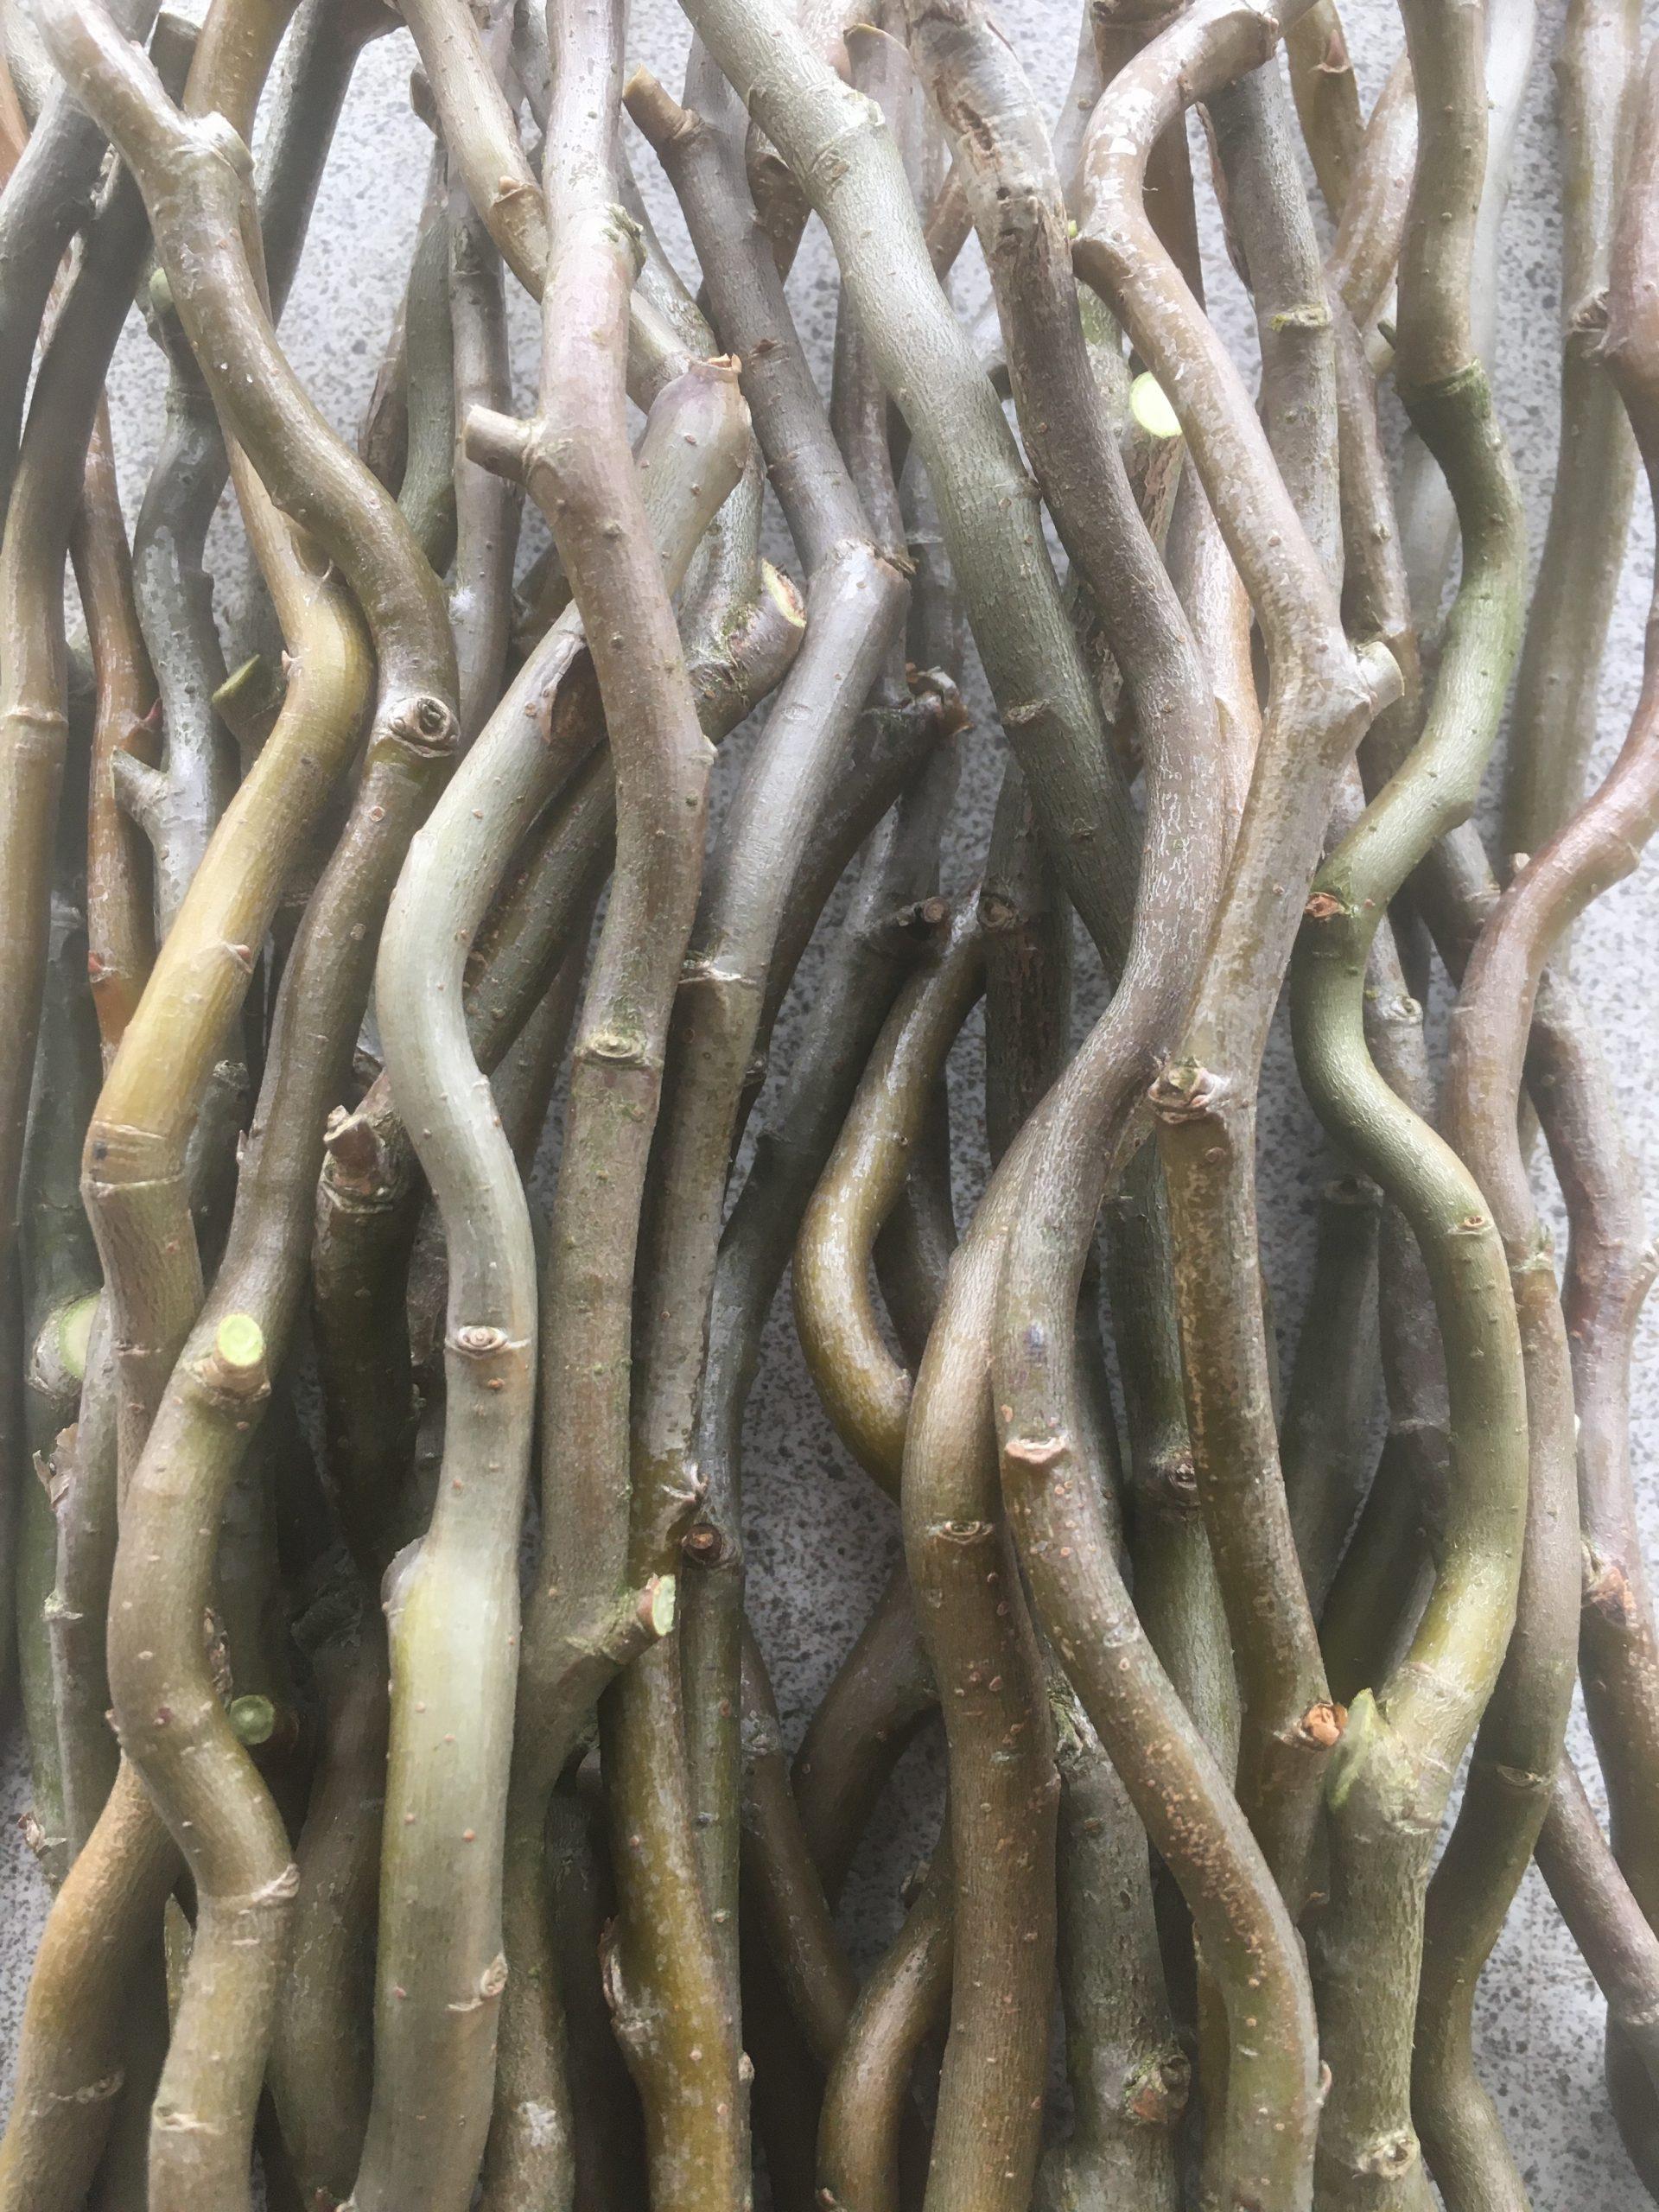 Salix Matsudana 'Tortuosa' (Corkscrew or Dragons Claw Willow) W785